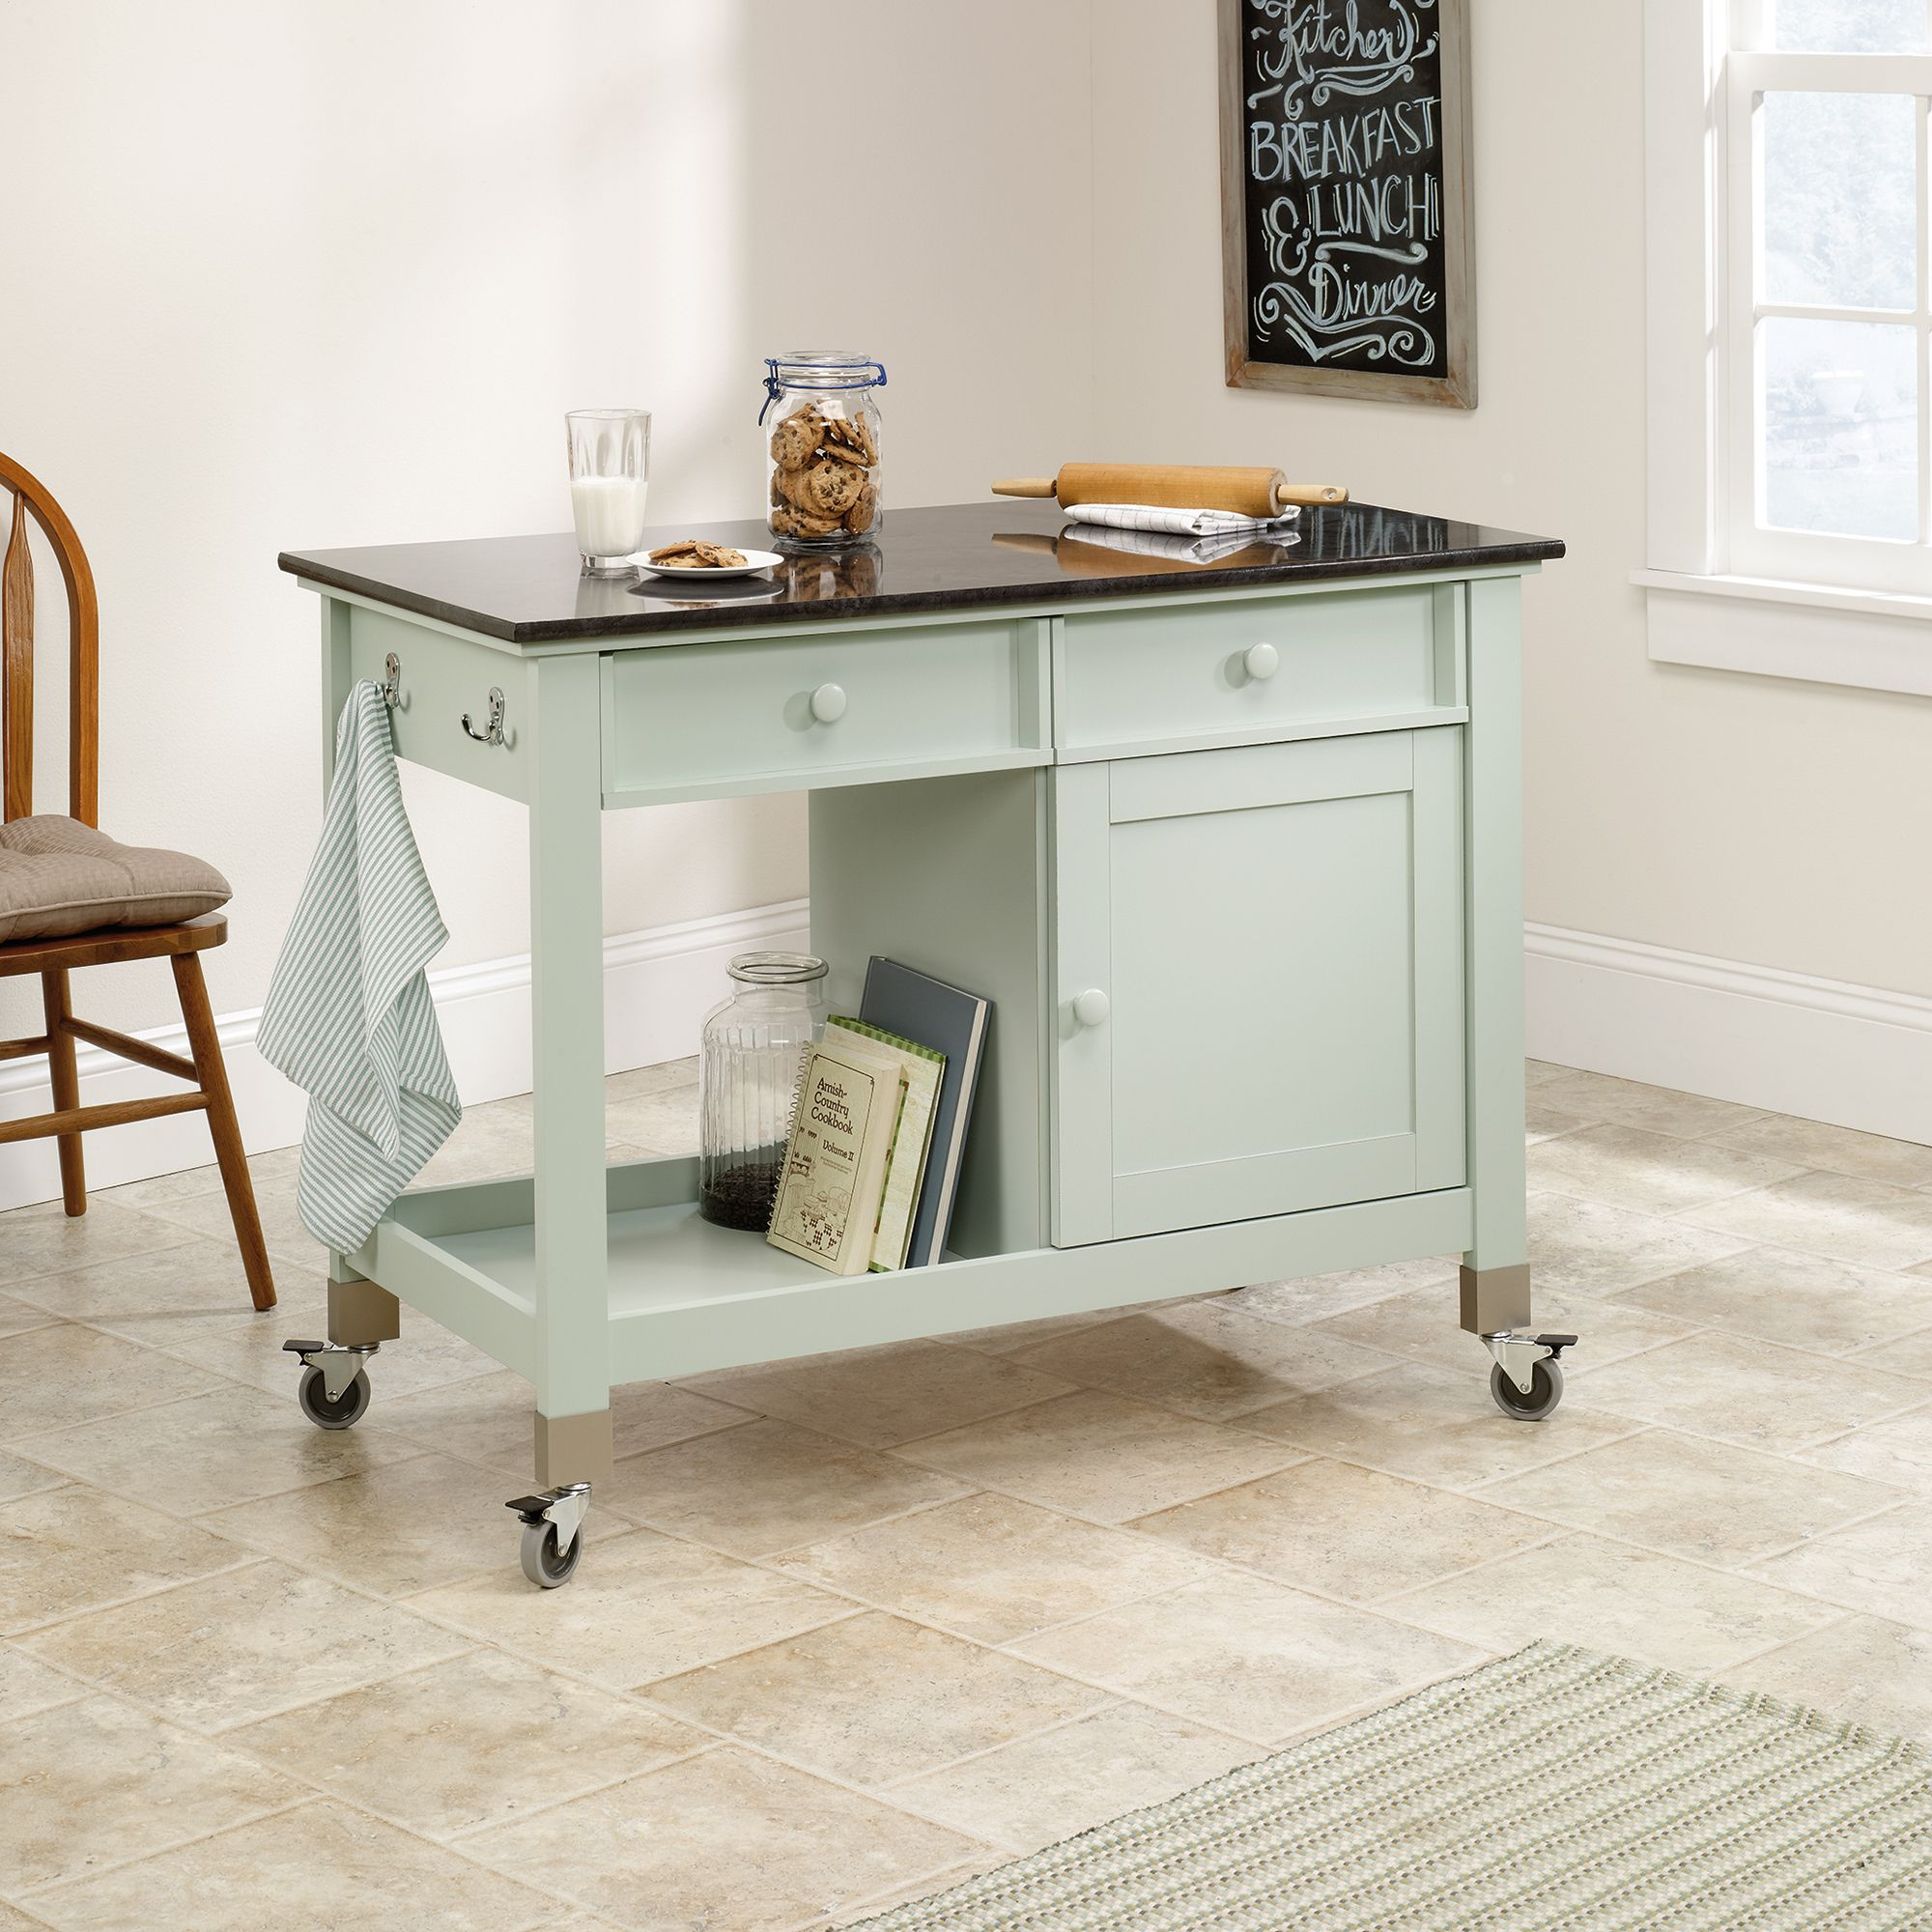 Diy Kitchen Island Cart Full Size Of Kitchen Island:diy Cart With ...